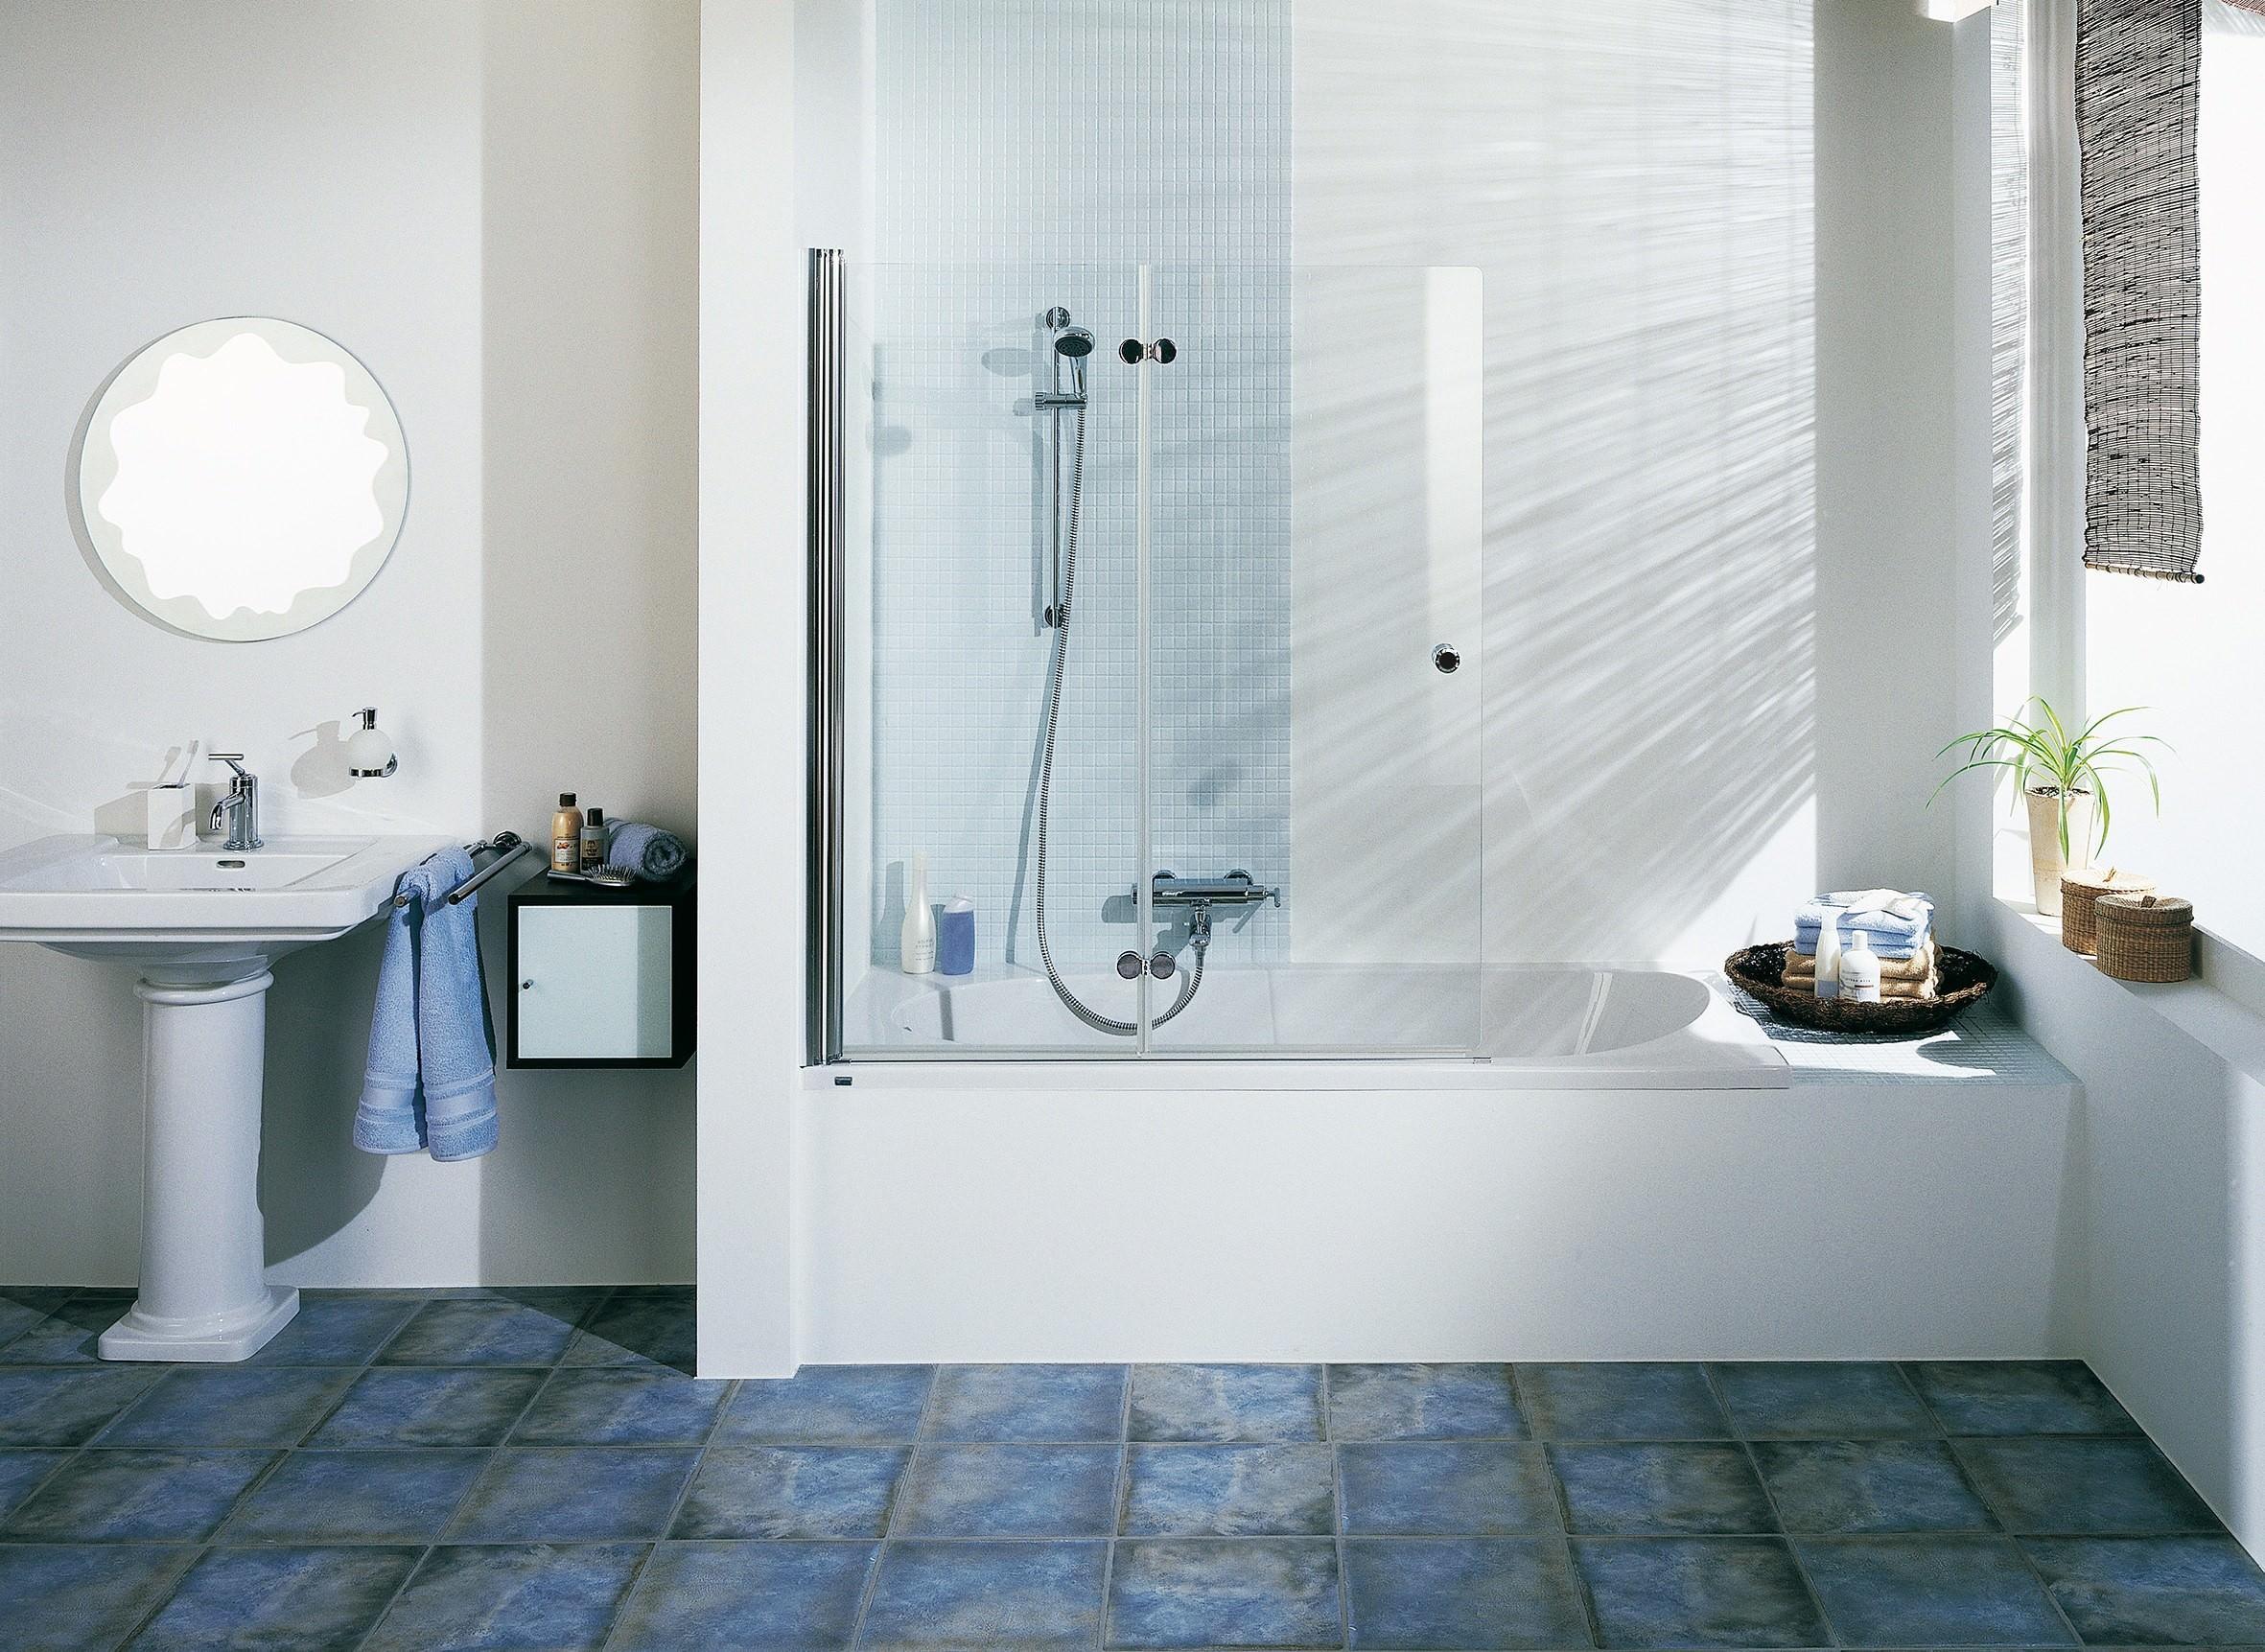 breuer elana komfort badewannendrehfaltt r 2 teilig klarglas hell alu silber matt 100cm 140cm. Black Bedroom Furniture Sets. Home Design Ideas